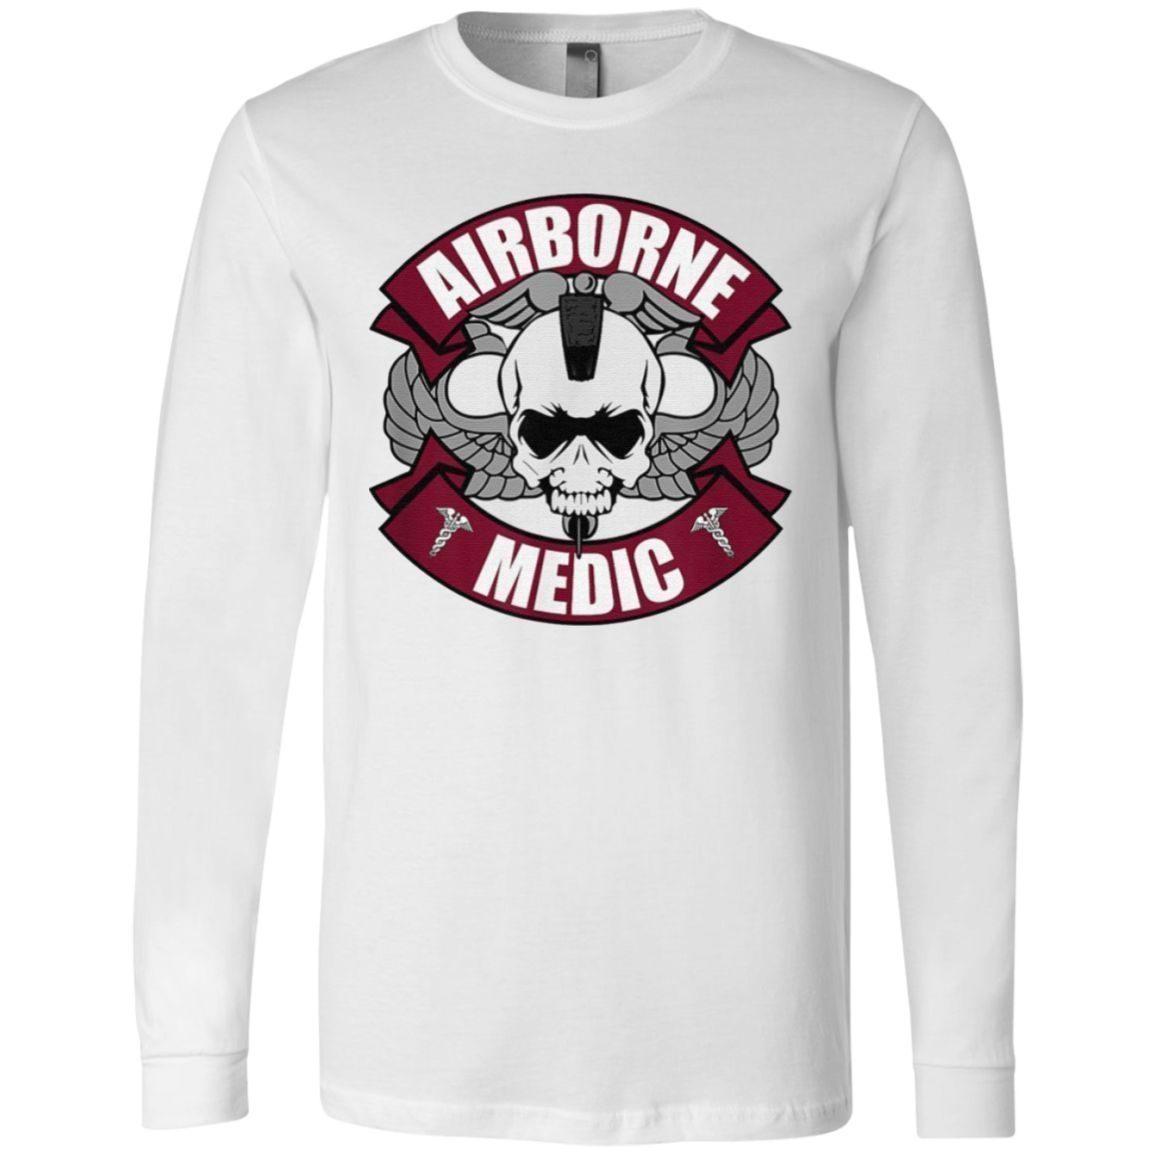 Airborne Medic T Shirt